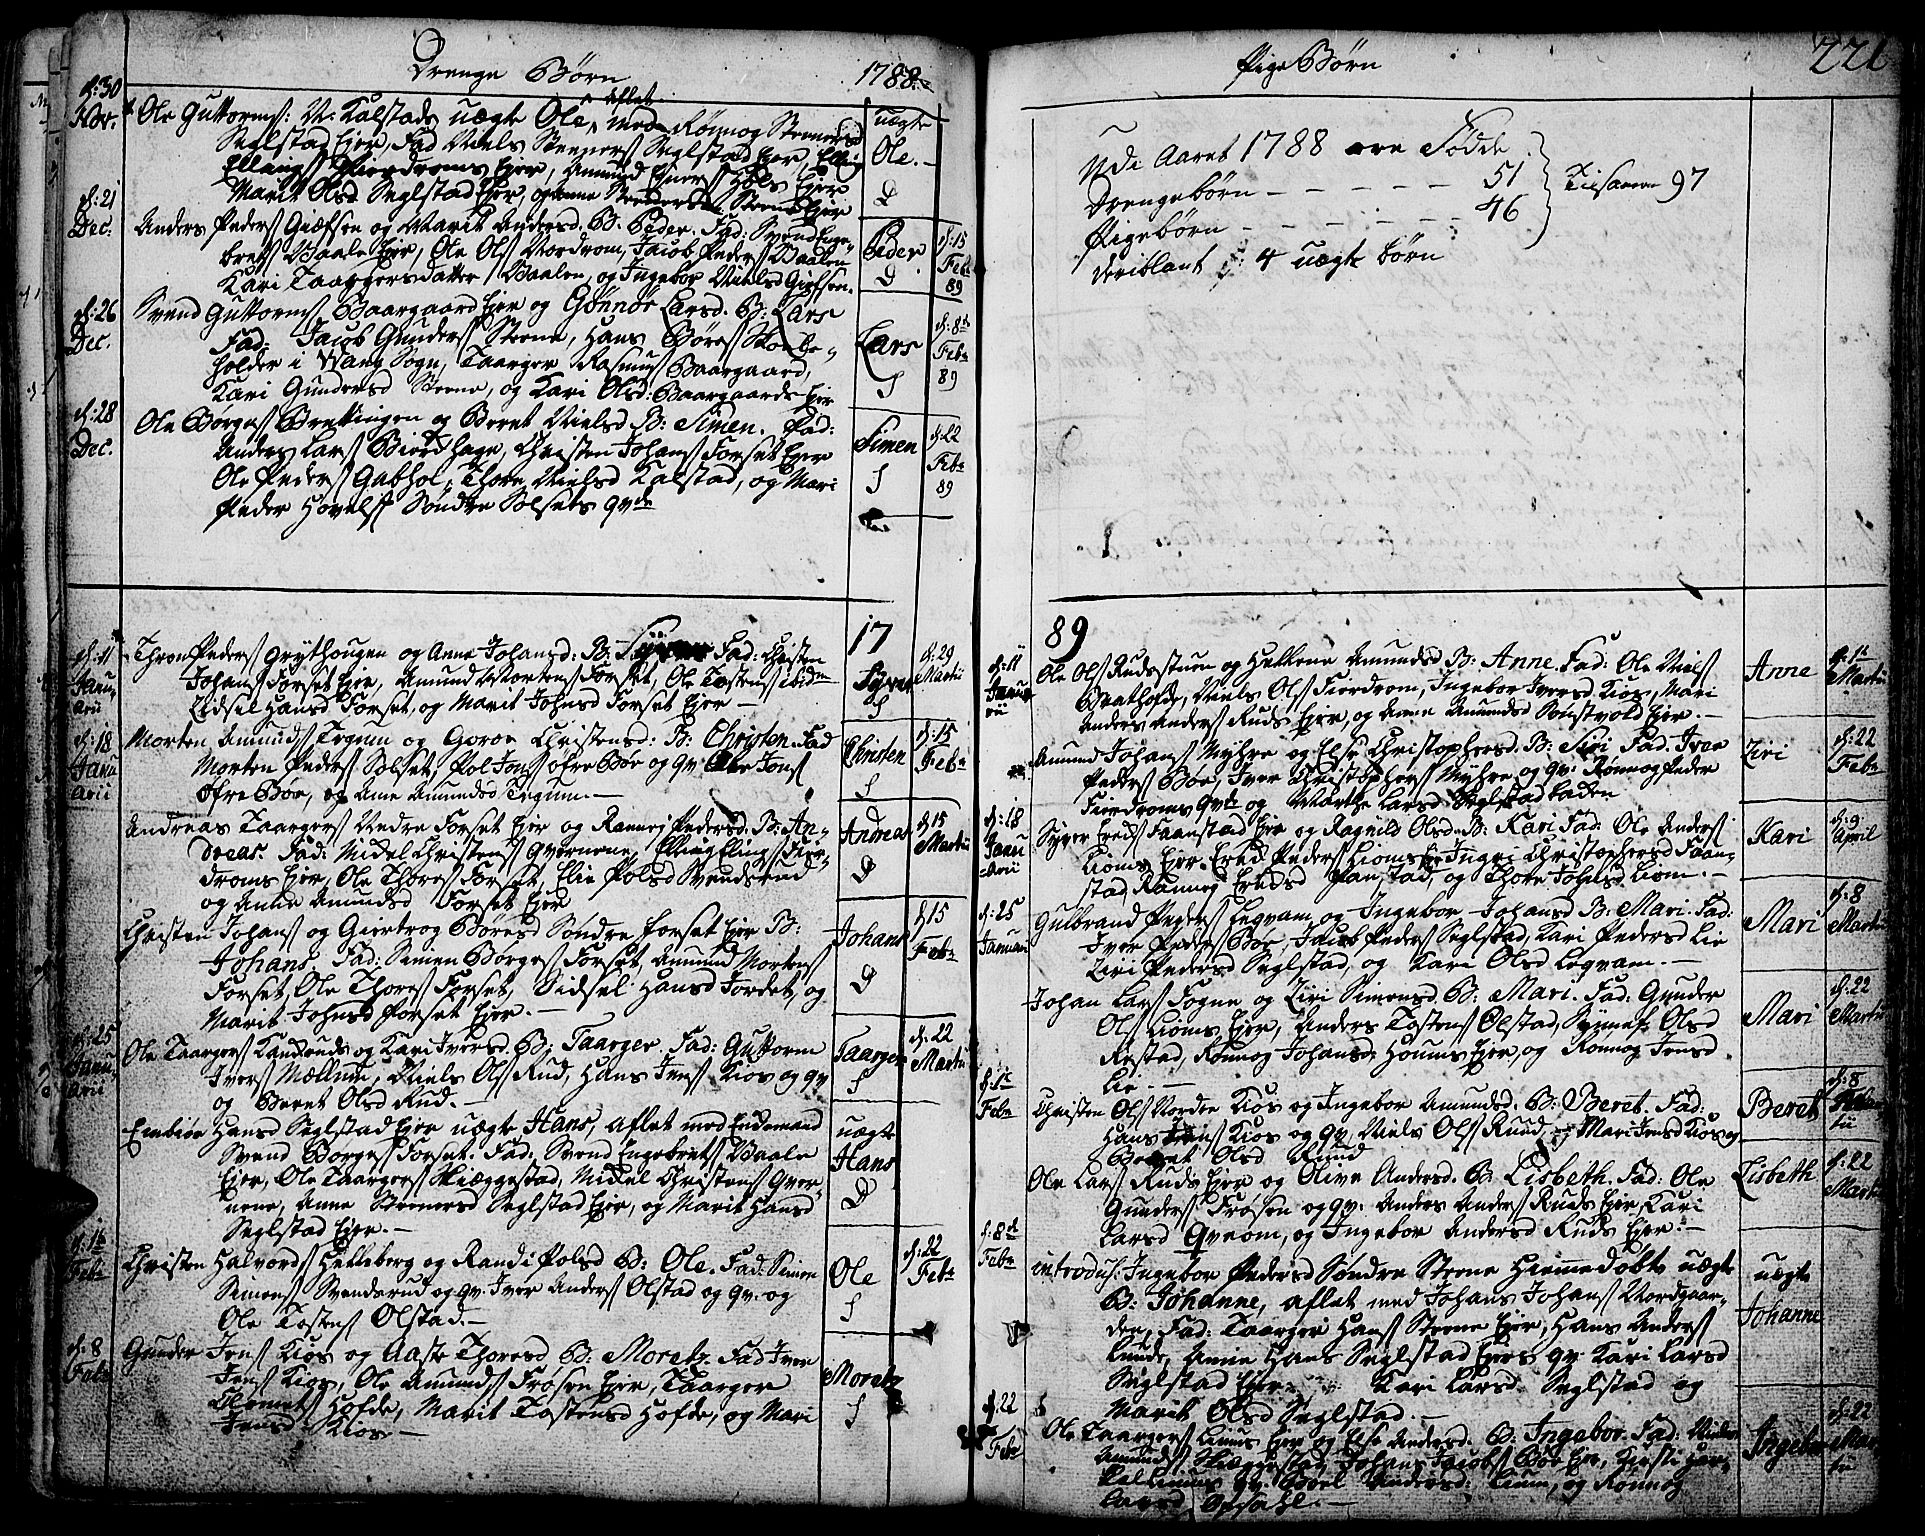 SAH, Gausdal prestekontor, Ministerialbok nr. 3, 1758-1809, s. 221